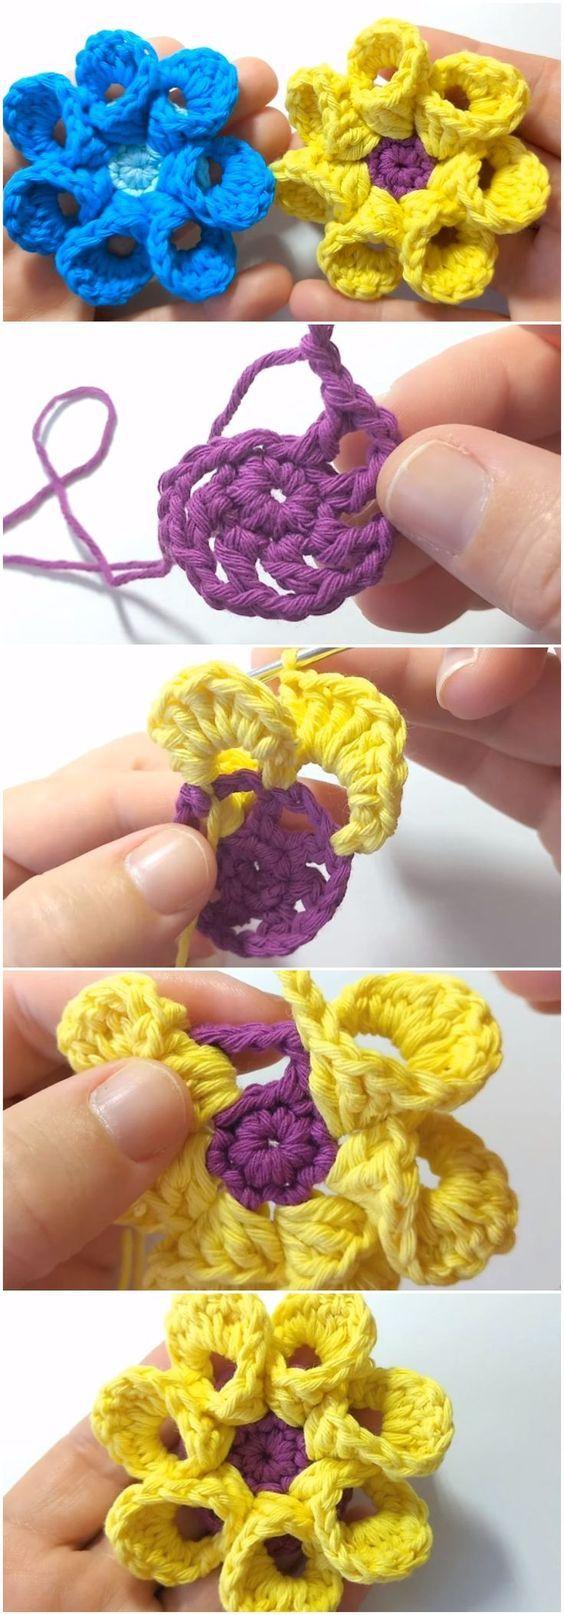 Crochet Flower Step By Step